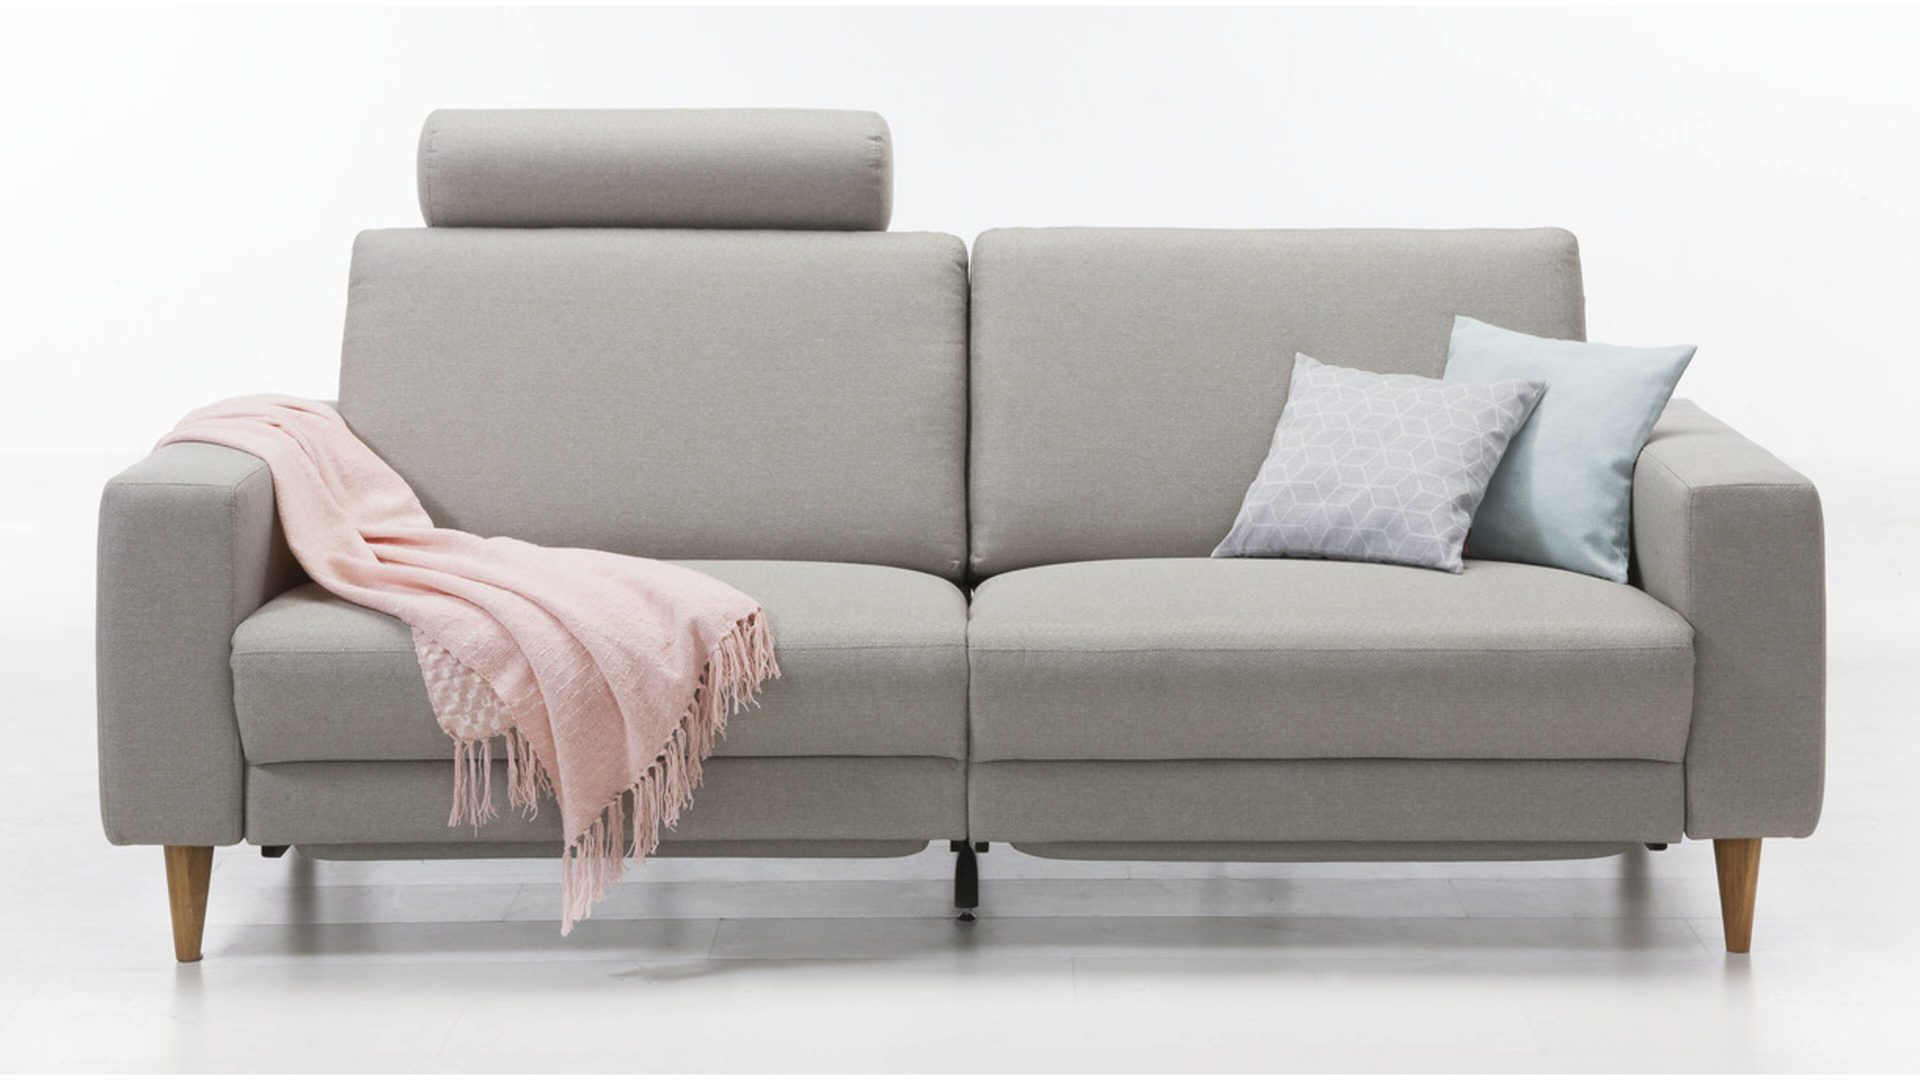 2 5 Sitzer Sofa Bzw Couch Lichtgrauer Bezug Idaho 2801 Geolte